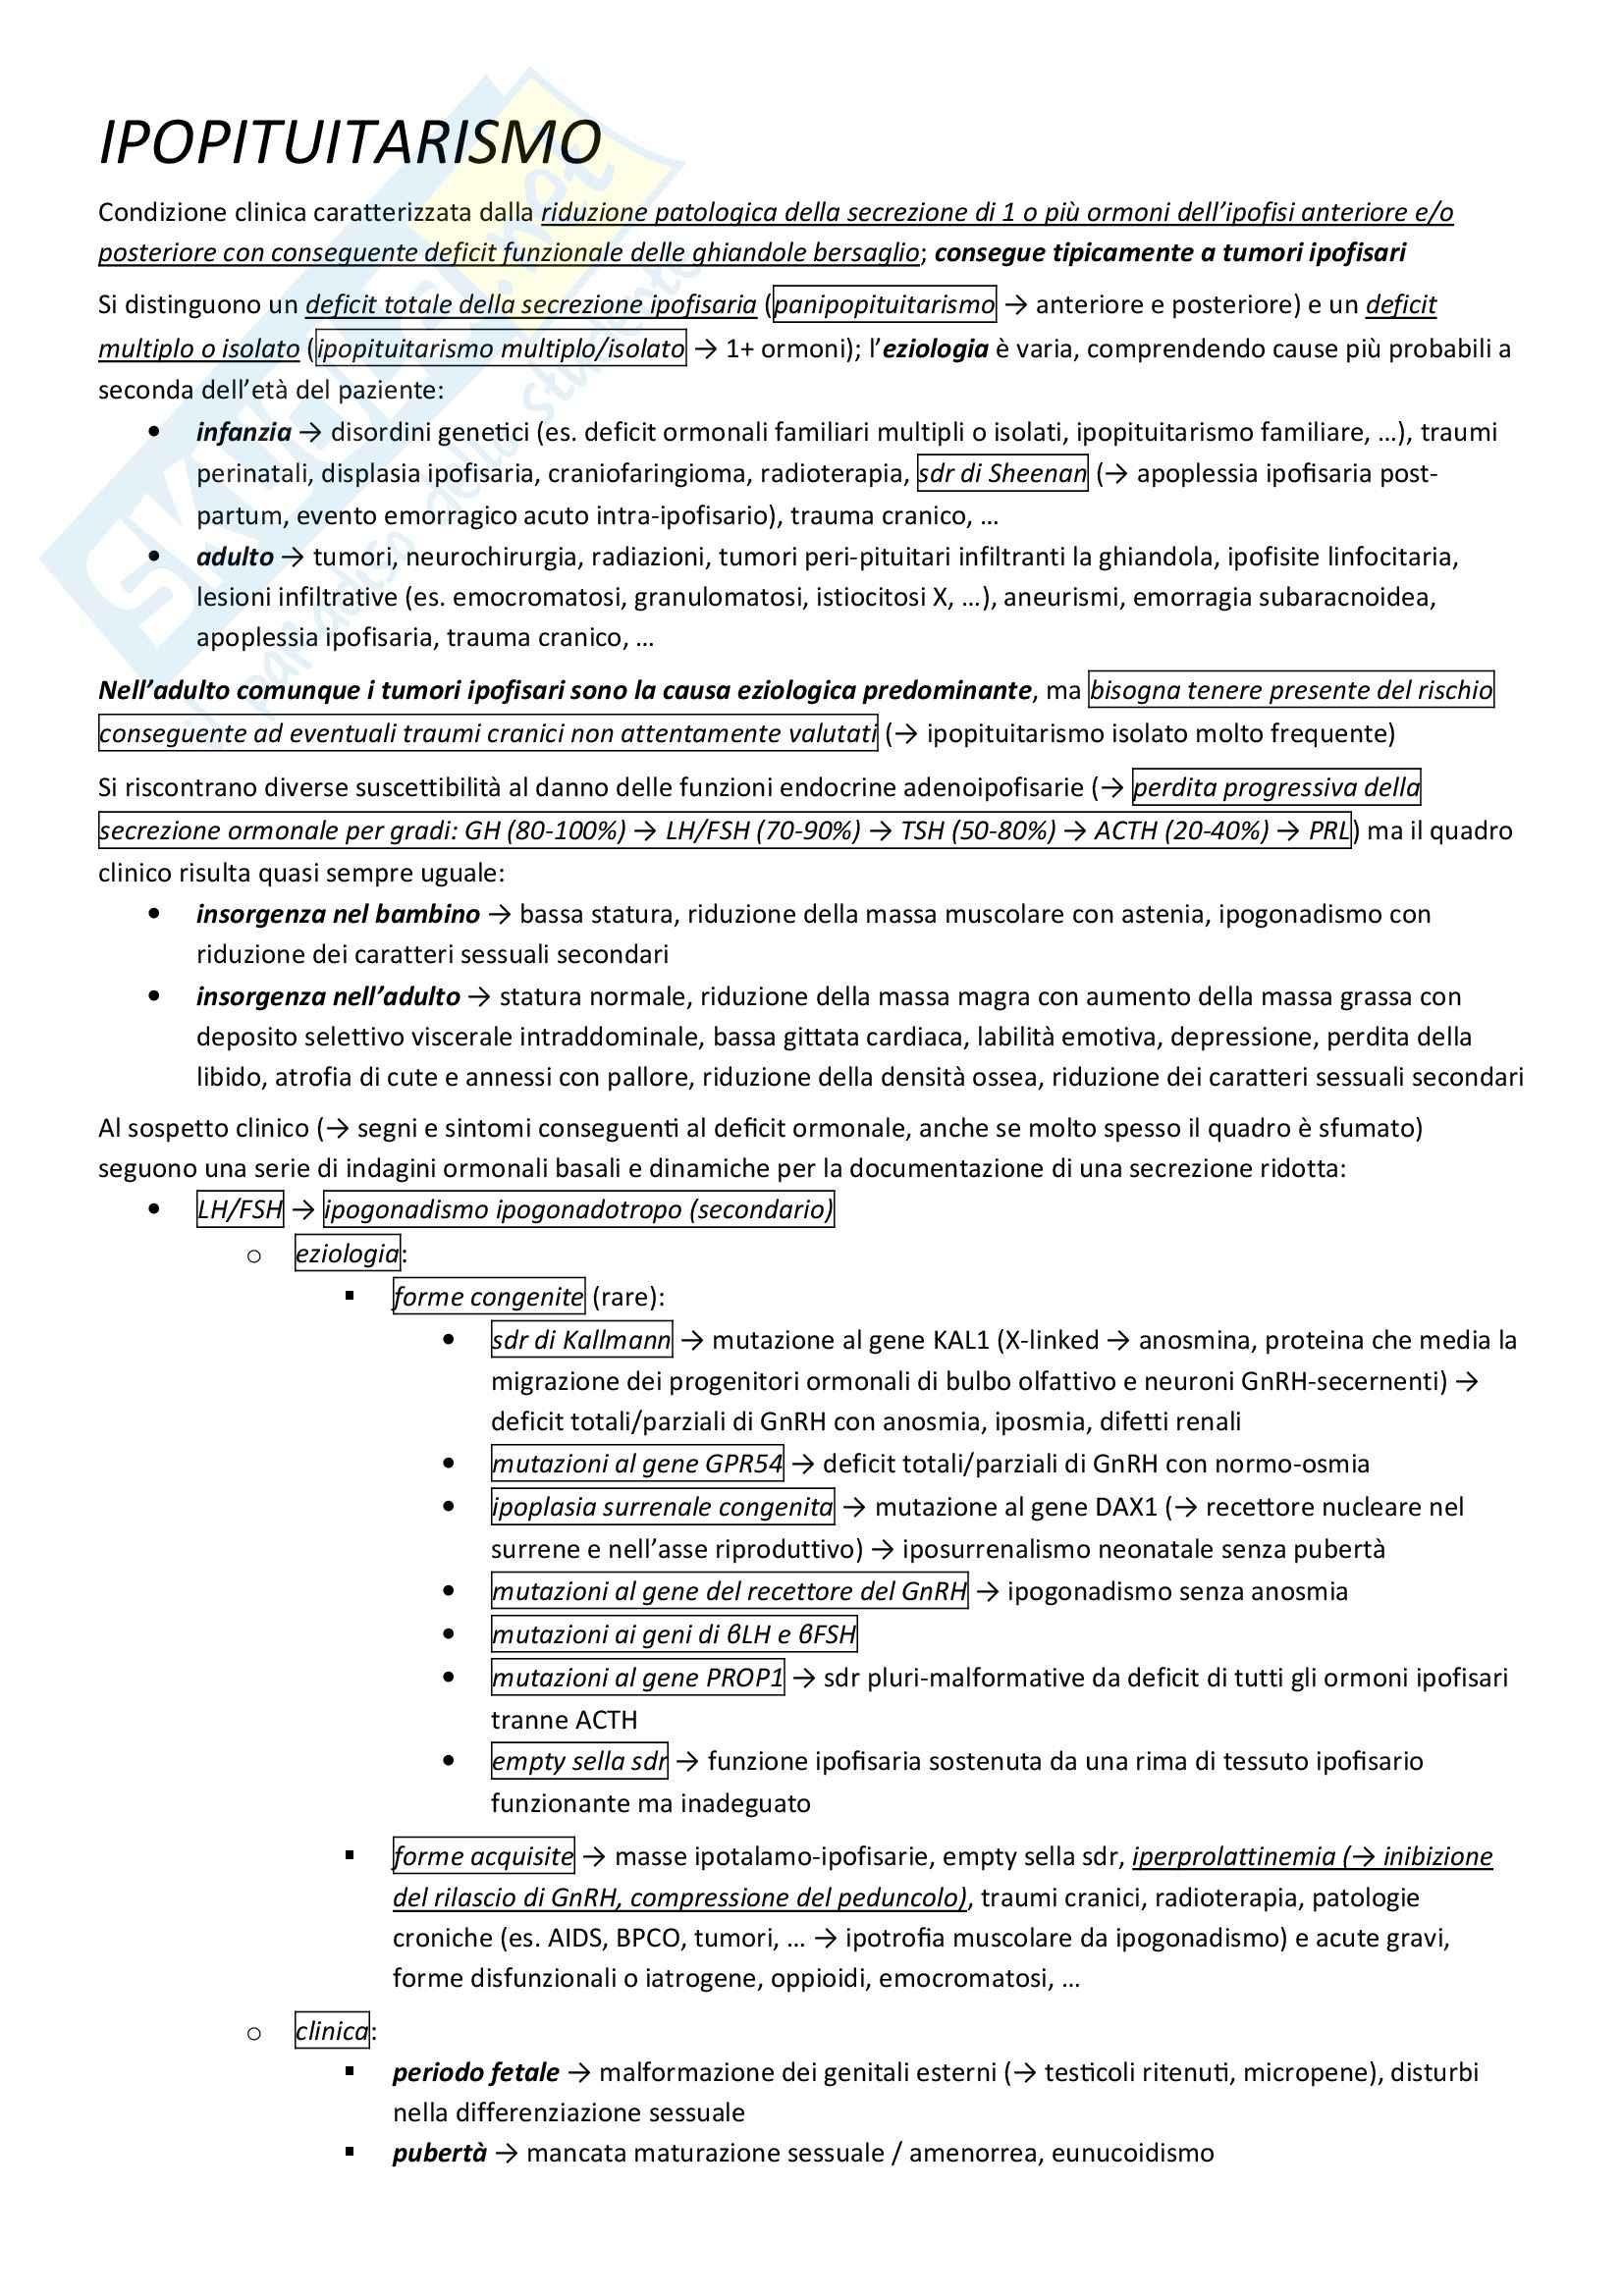 Endocrinologia - ipopituitarismo Pag. 1